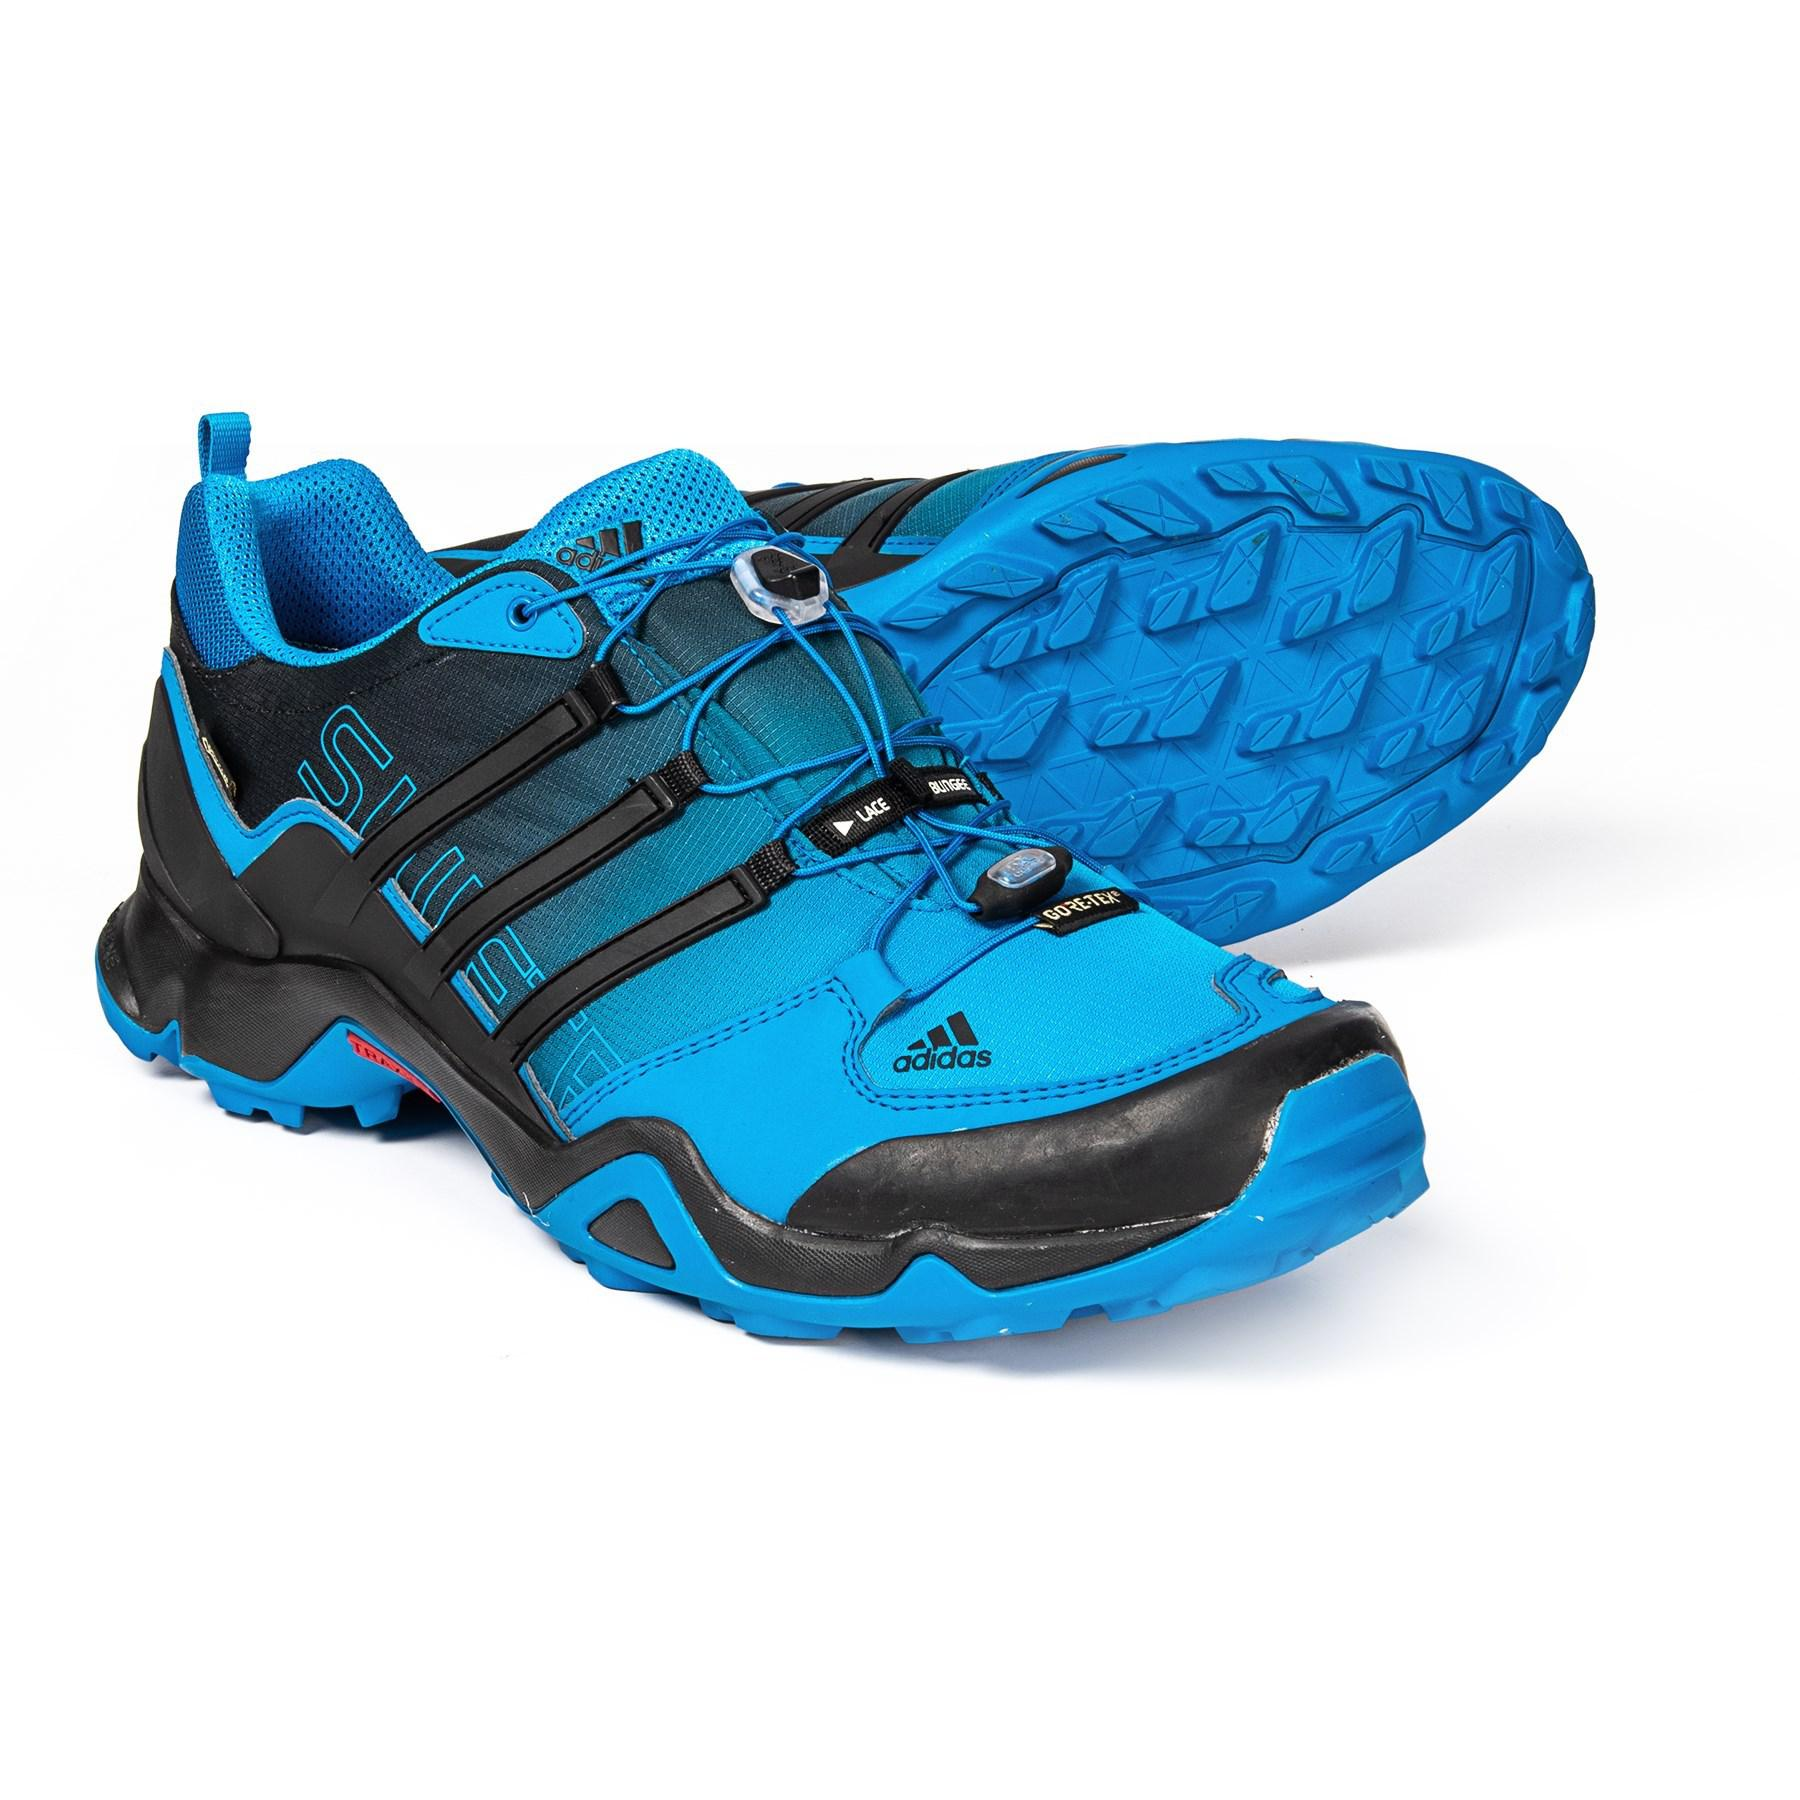 47aa50596 Lyst - adidas Terrex Swift R Gore-tex® Xcr® Trail Running Shoes in ...